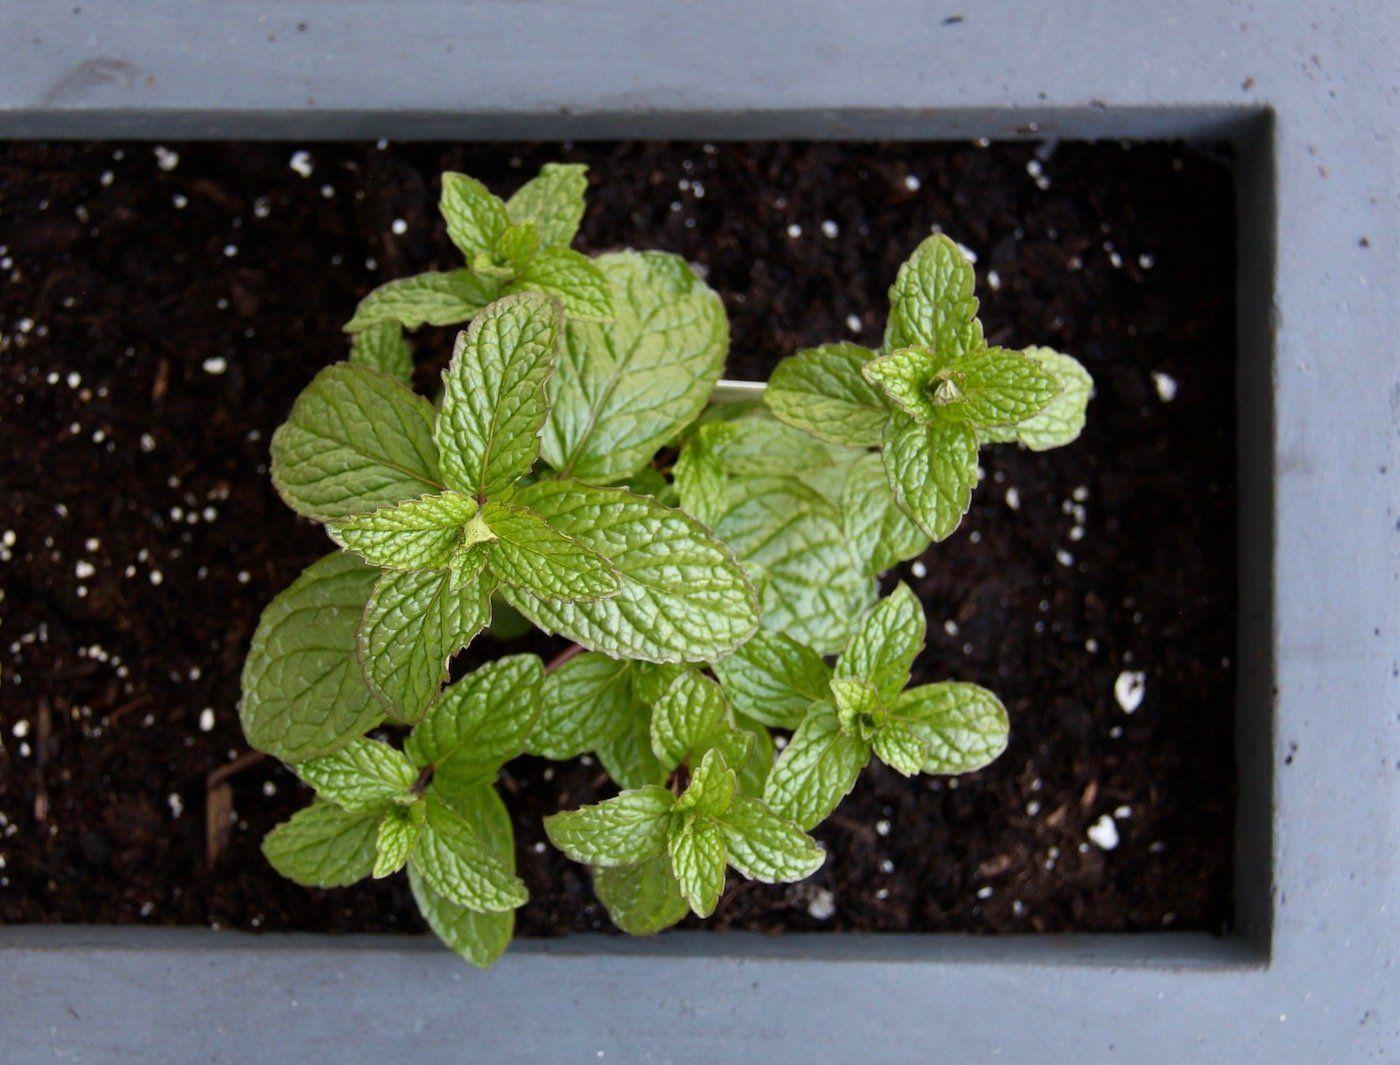 Promix Gardening